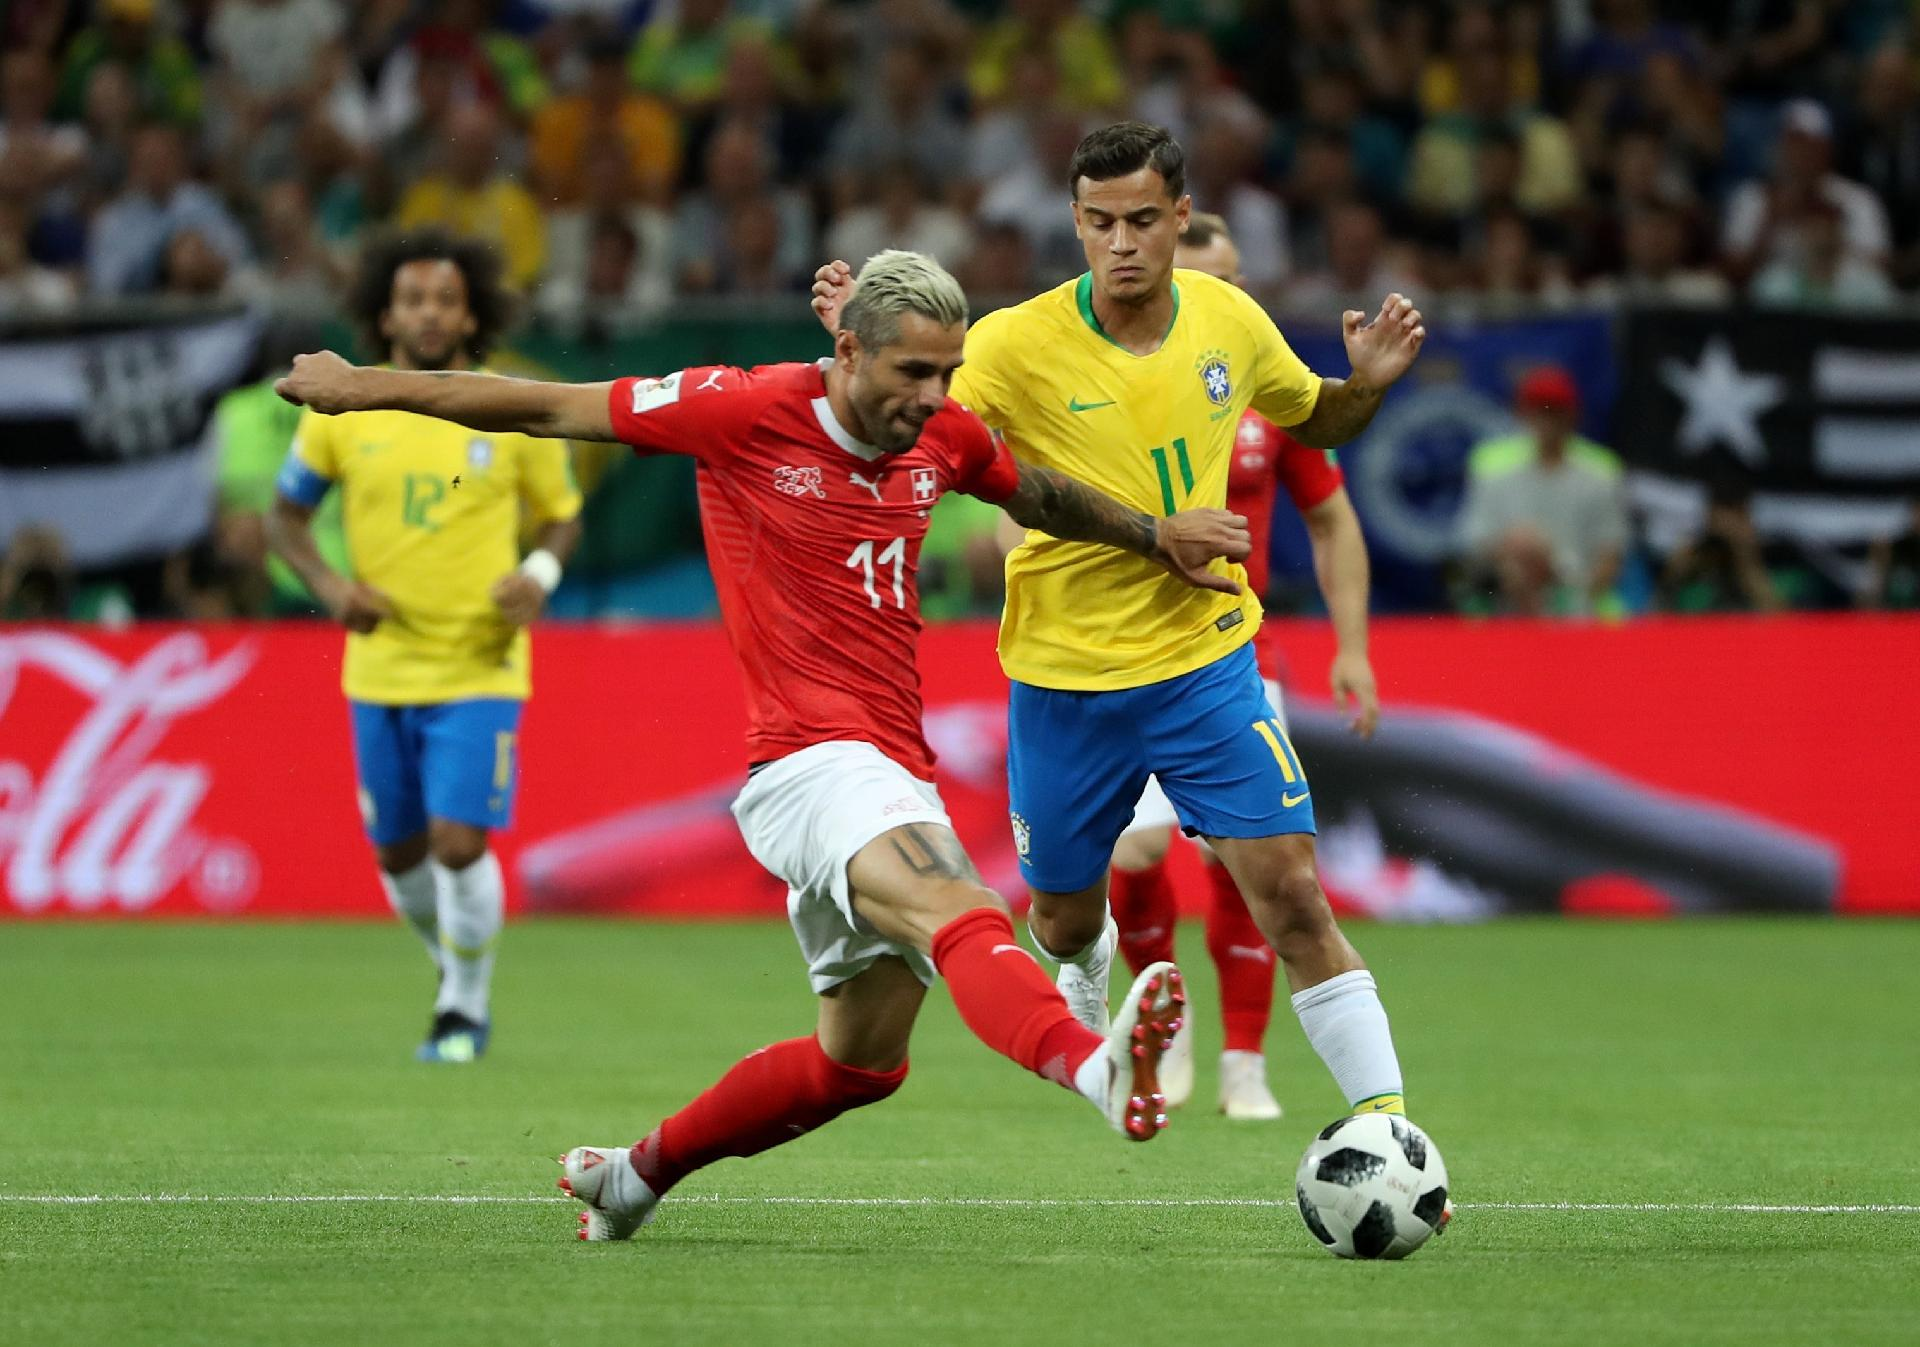 Copa do Mundo 2018  Brasil leva empate da Suíça e deixa estreia reclamando  do árbitro de vídeo - UOL Copa do Mundo 2018 42158e30d5cb3